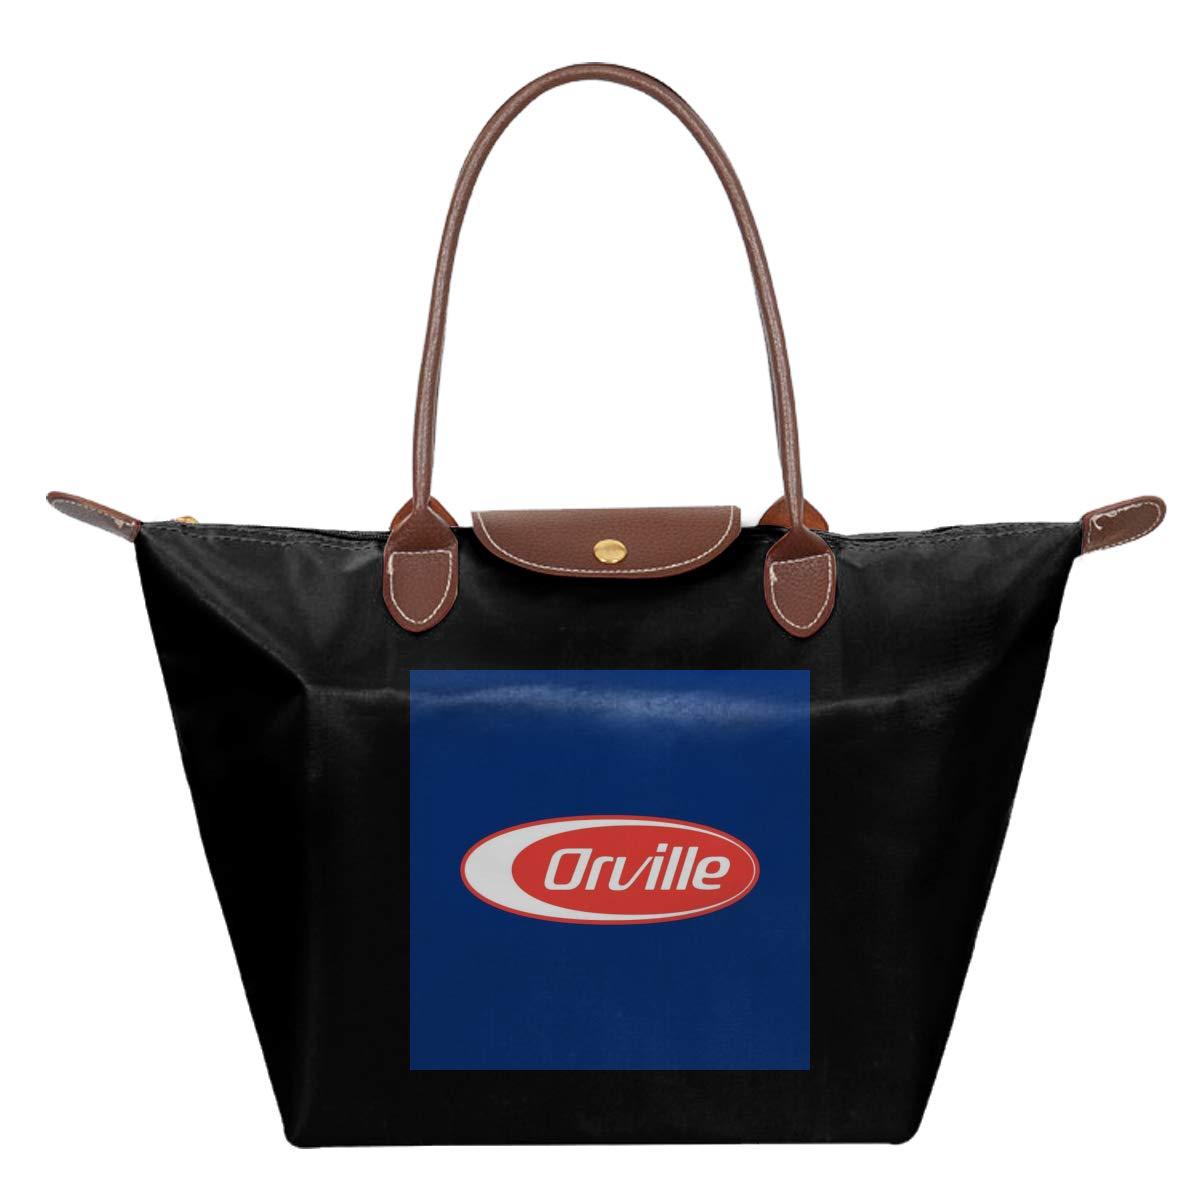 Orville Barilla Logo Mix Waterproof Leather Folded Messenger Nylon Bag Travel Tote Hopping Folding School Handbags